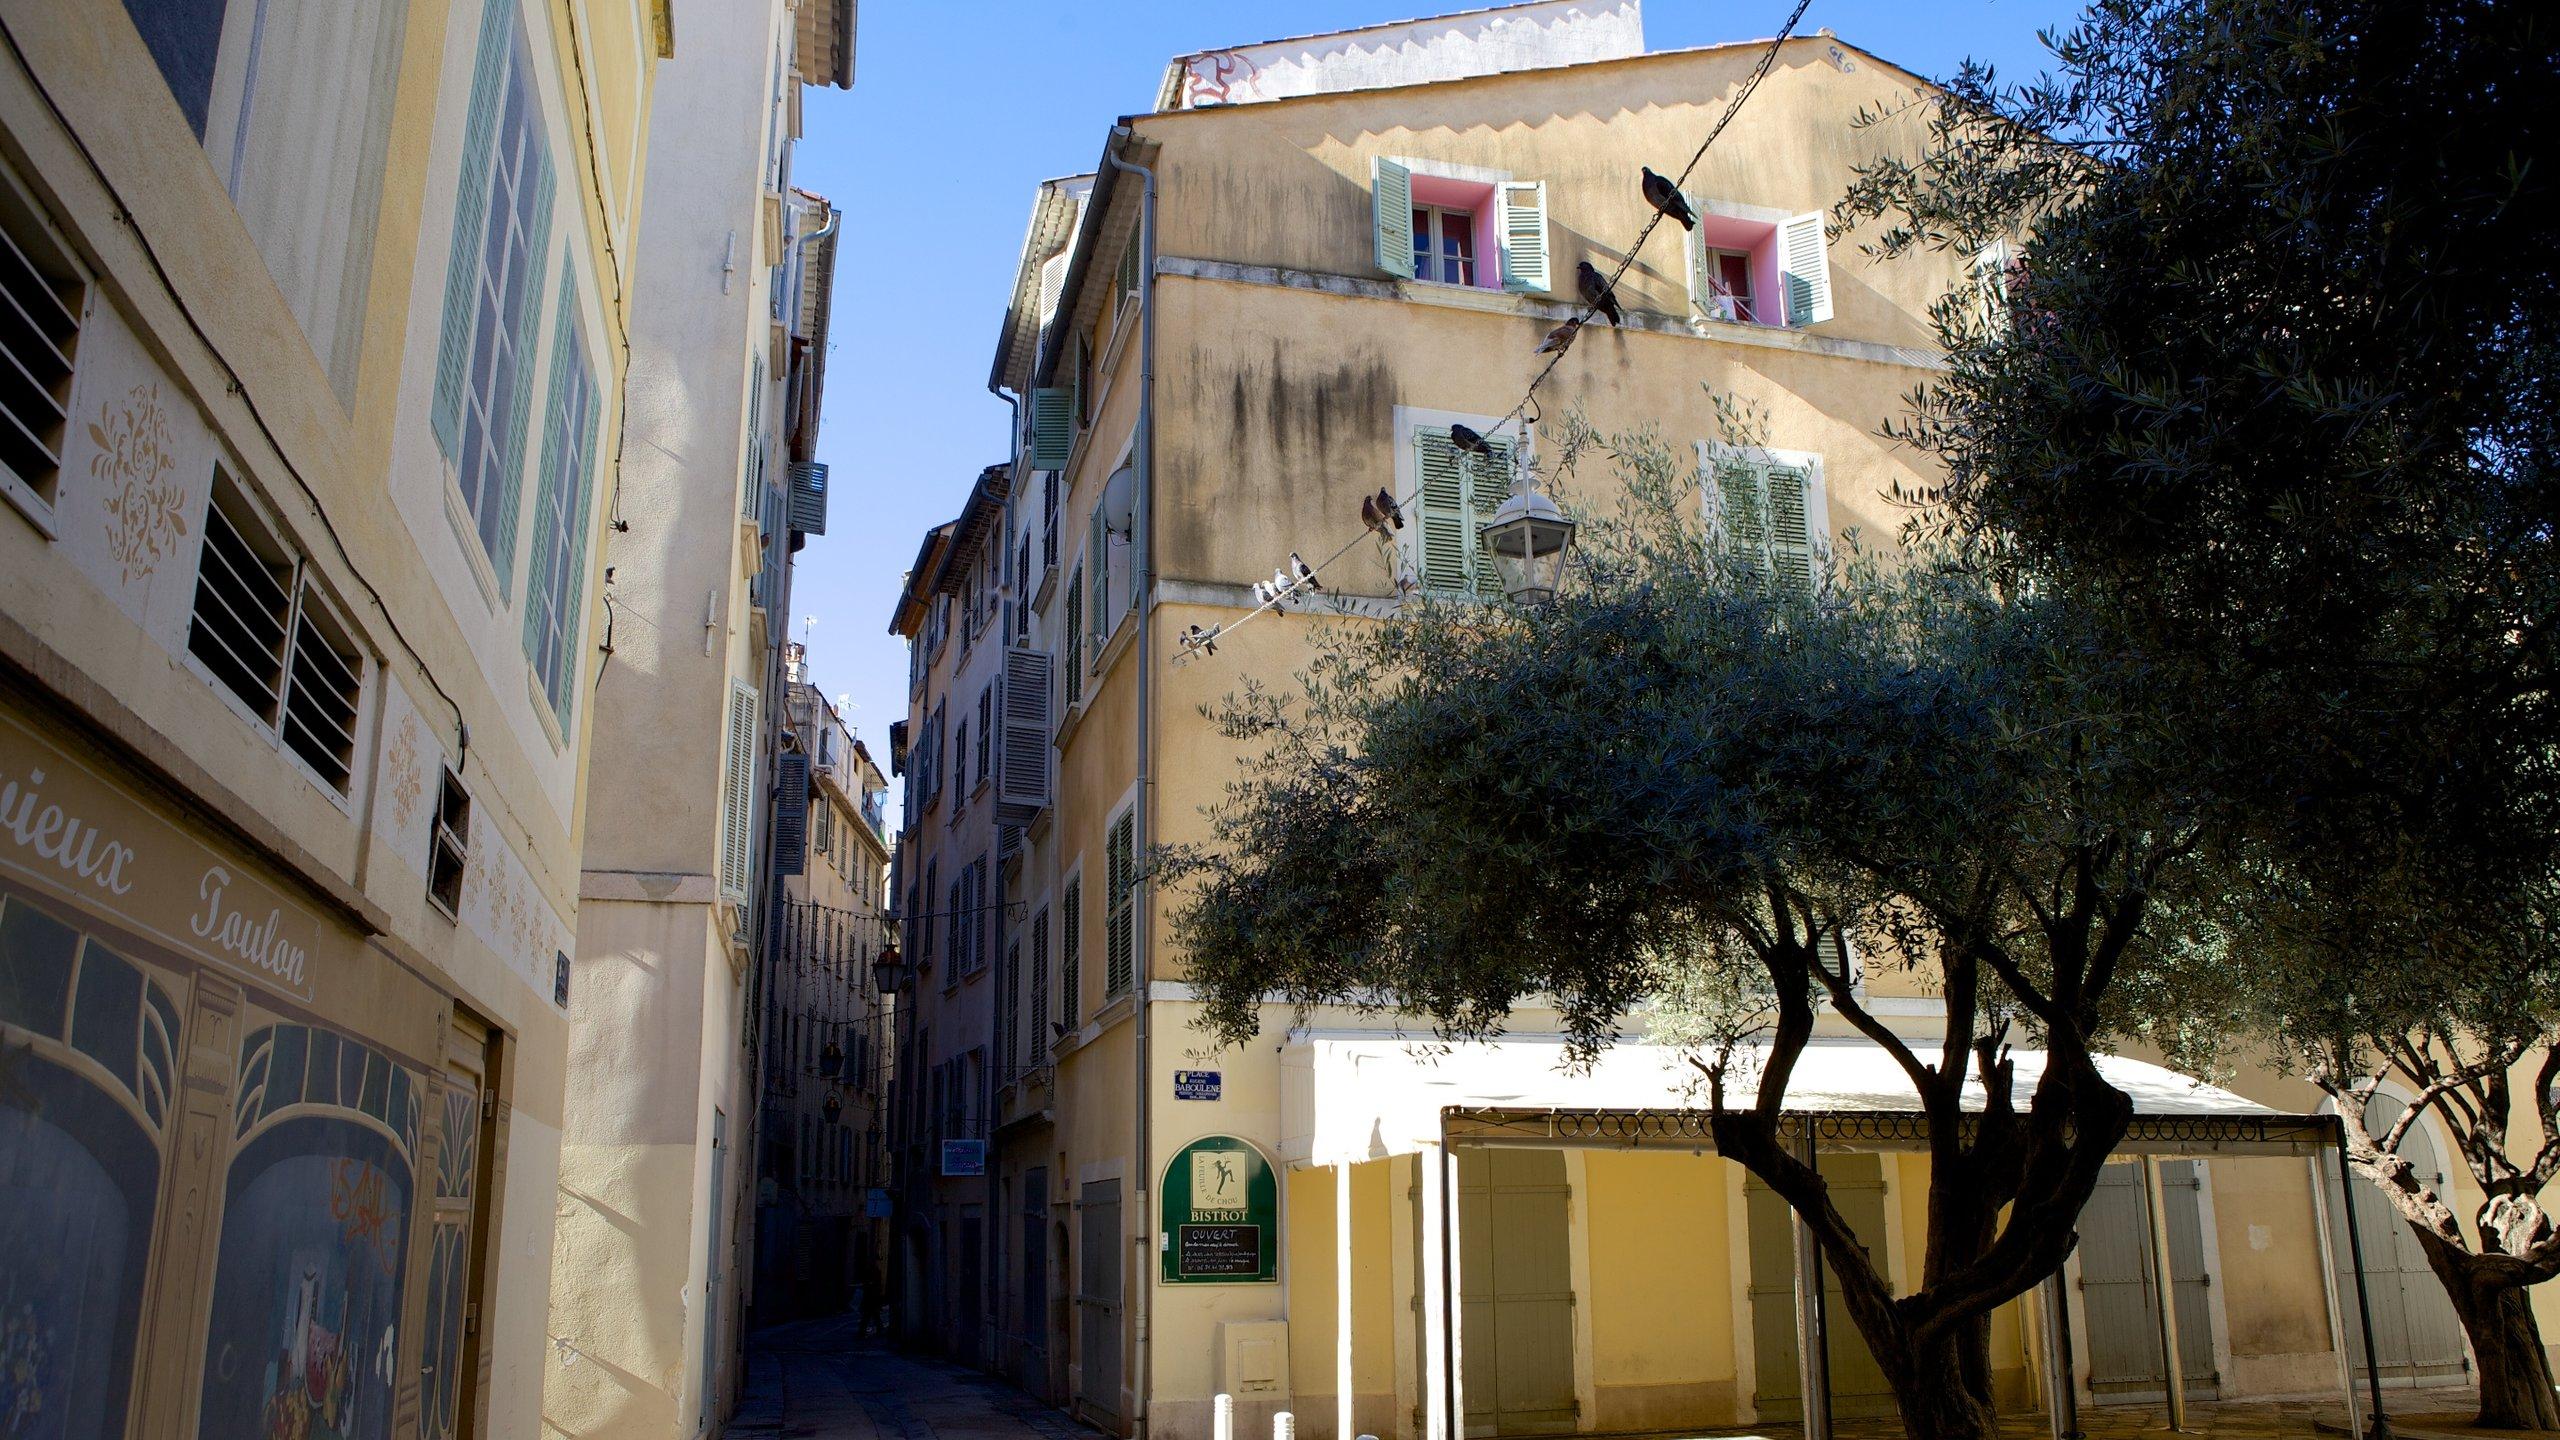 Métropole Toulon-Provence-Méditerranée, Var, France